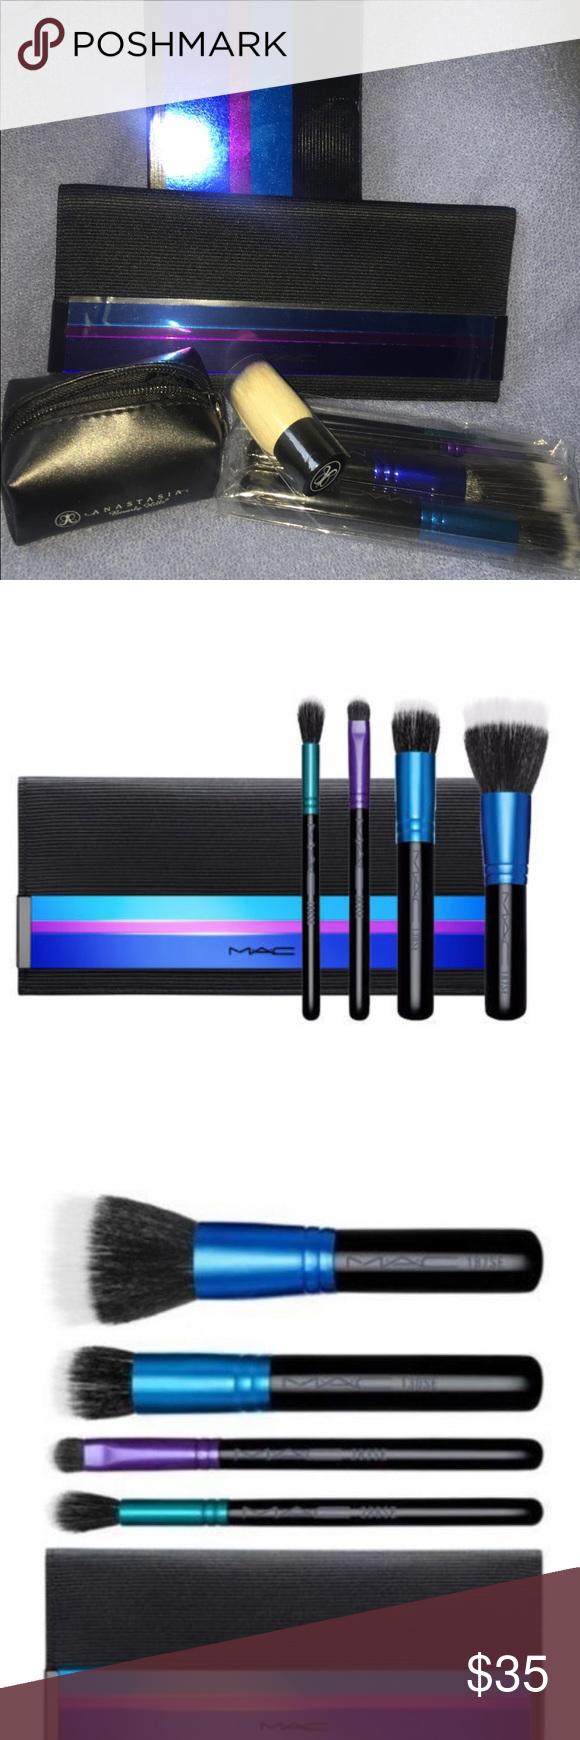 Brand new Mac brush set NWT Mac brushes, Eye brushes